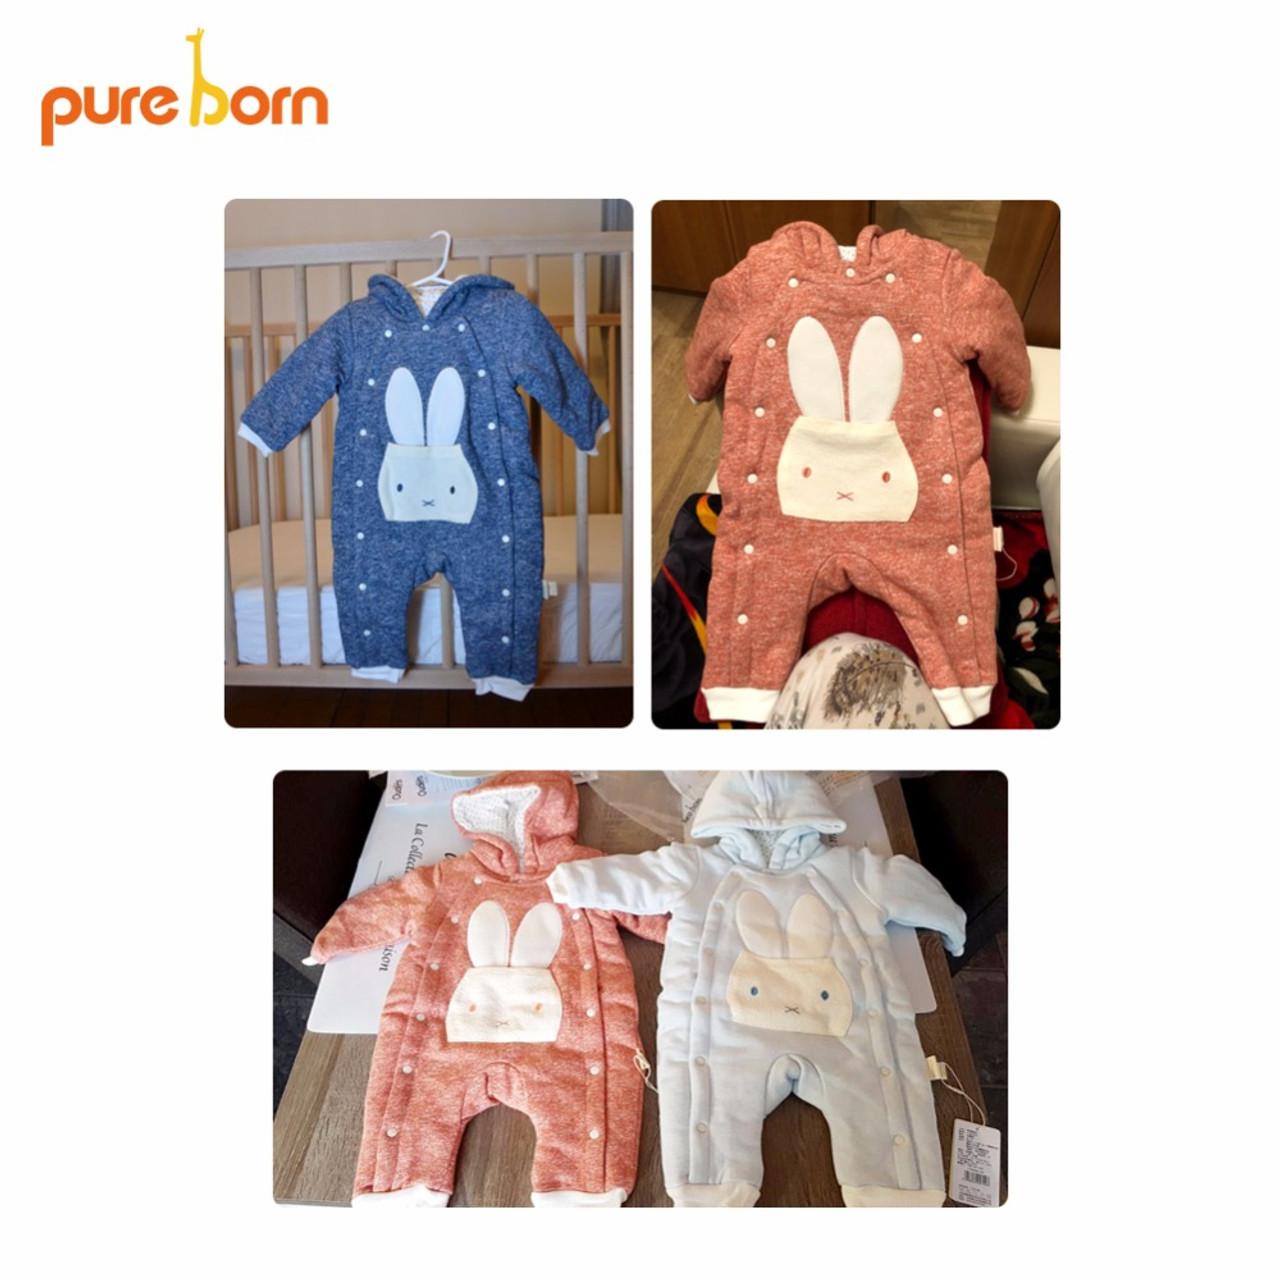 0244beb6bb30 ... Pureborn Baby Romper Cartoon Rabbit Baby Clothes 2018 Cotton Jumpsuit  Newborn Hooded Overall Baby Girl Boys ...